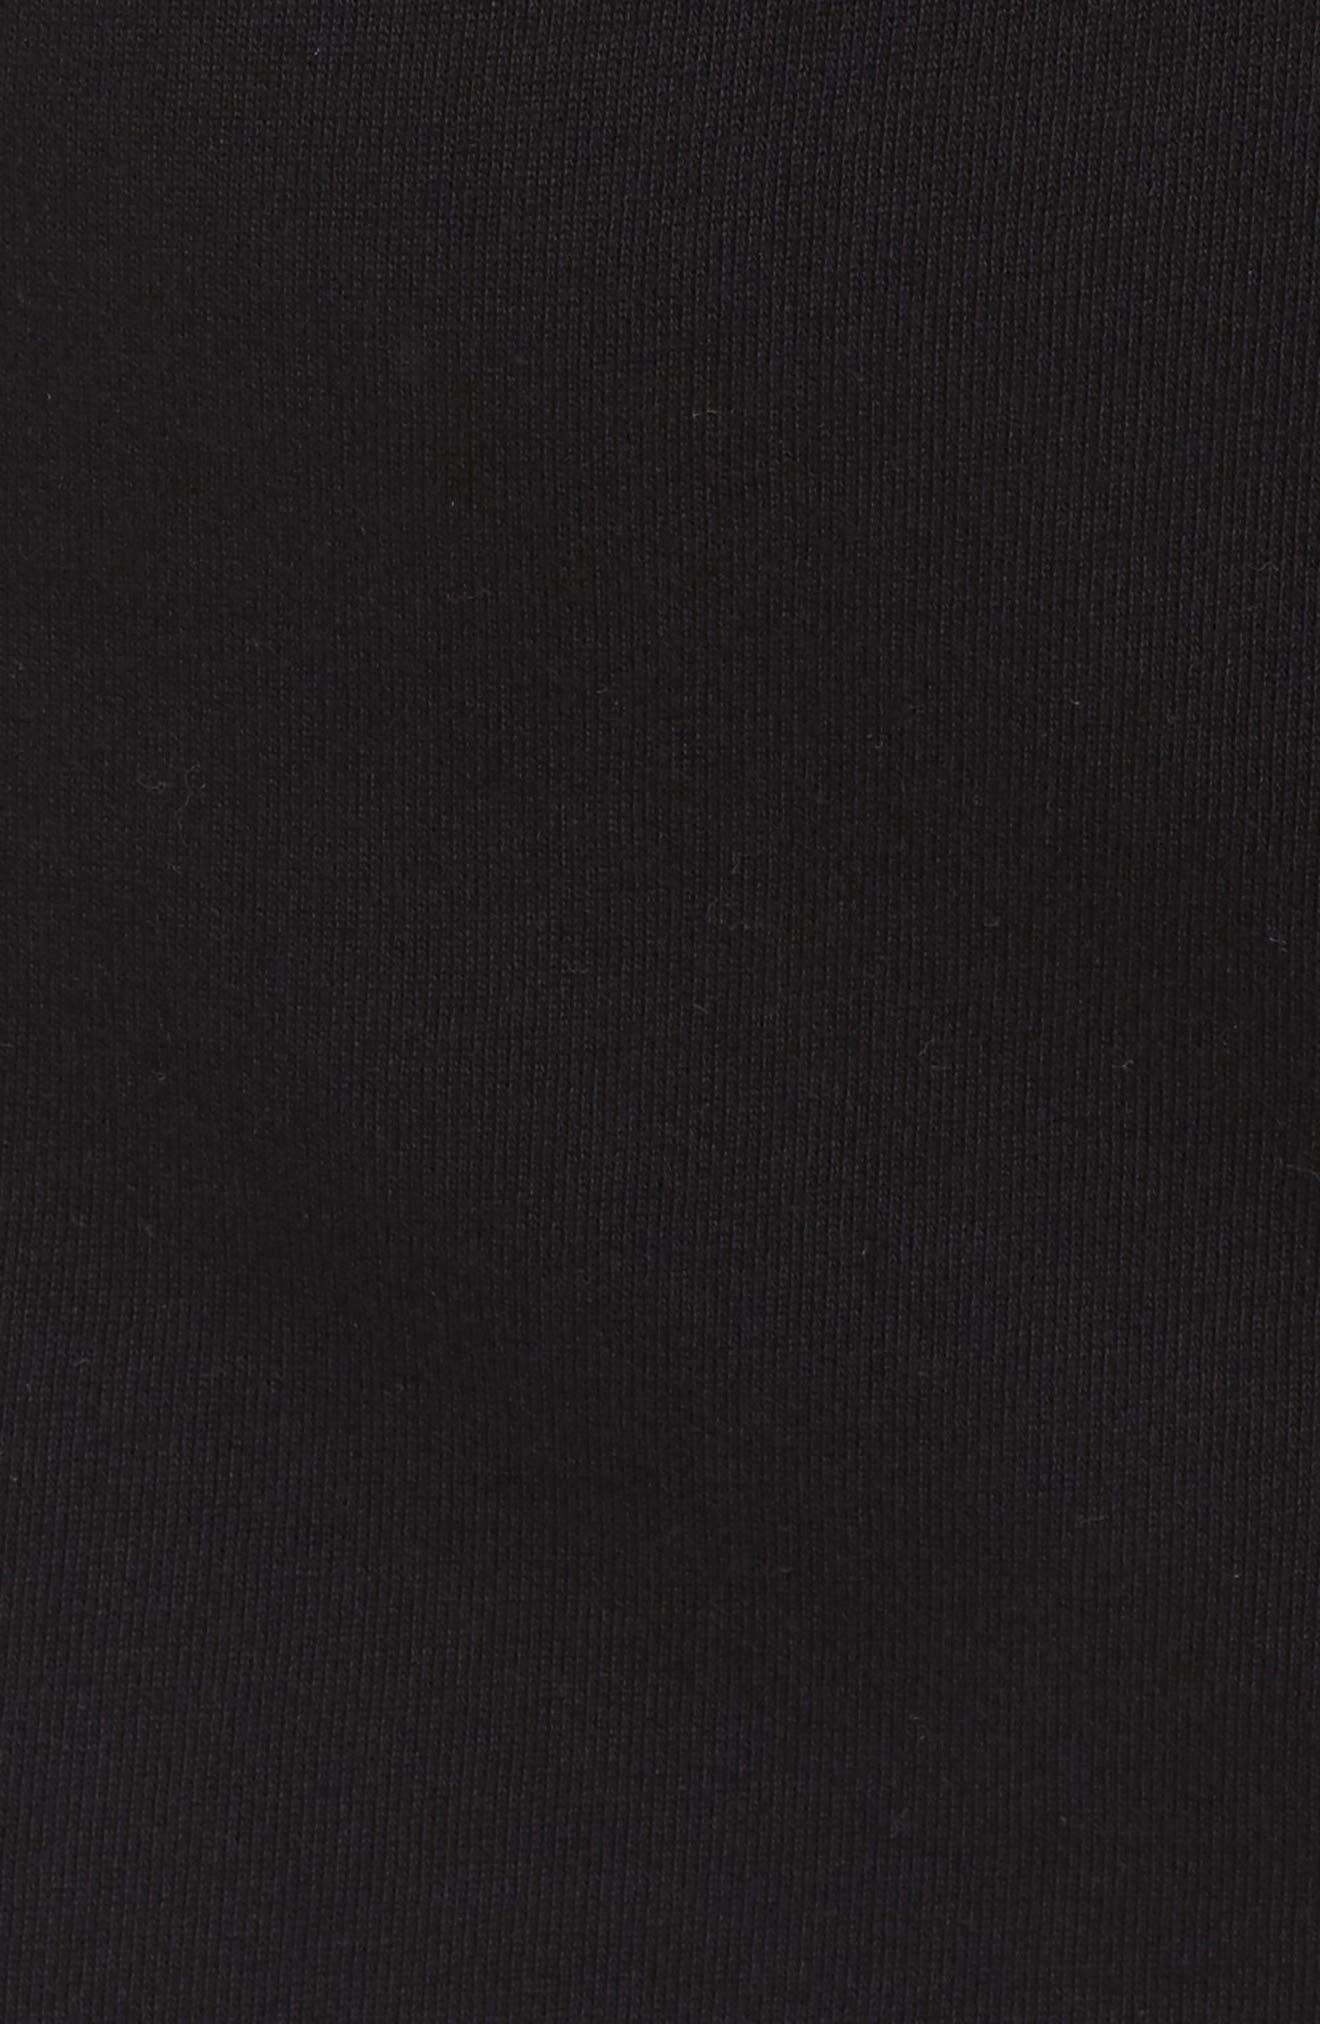 Off-Duty Hooded Sweatshirt Dress,                             Alternate thumbnail 5, color,                             Black